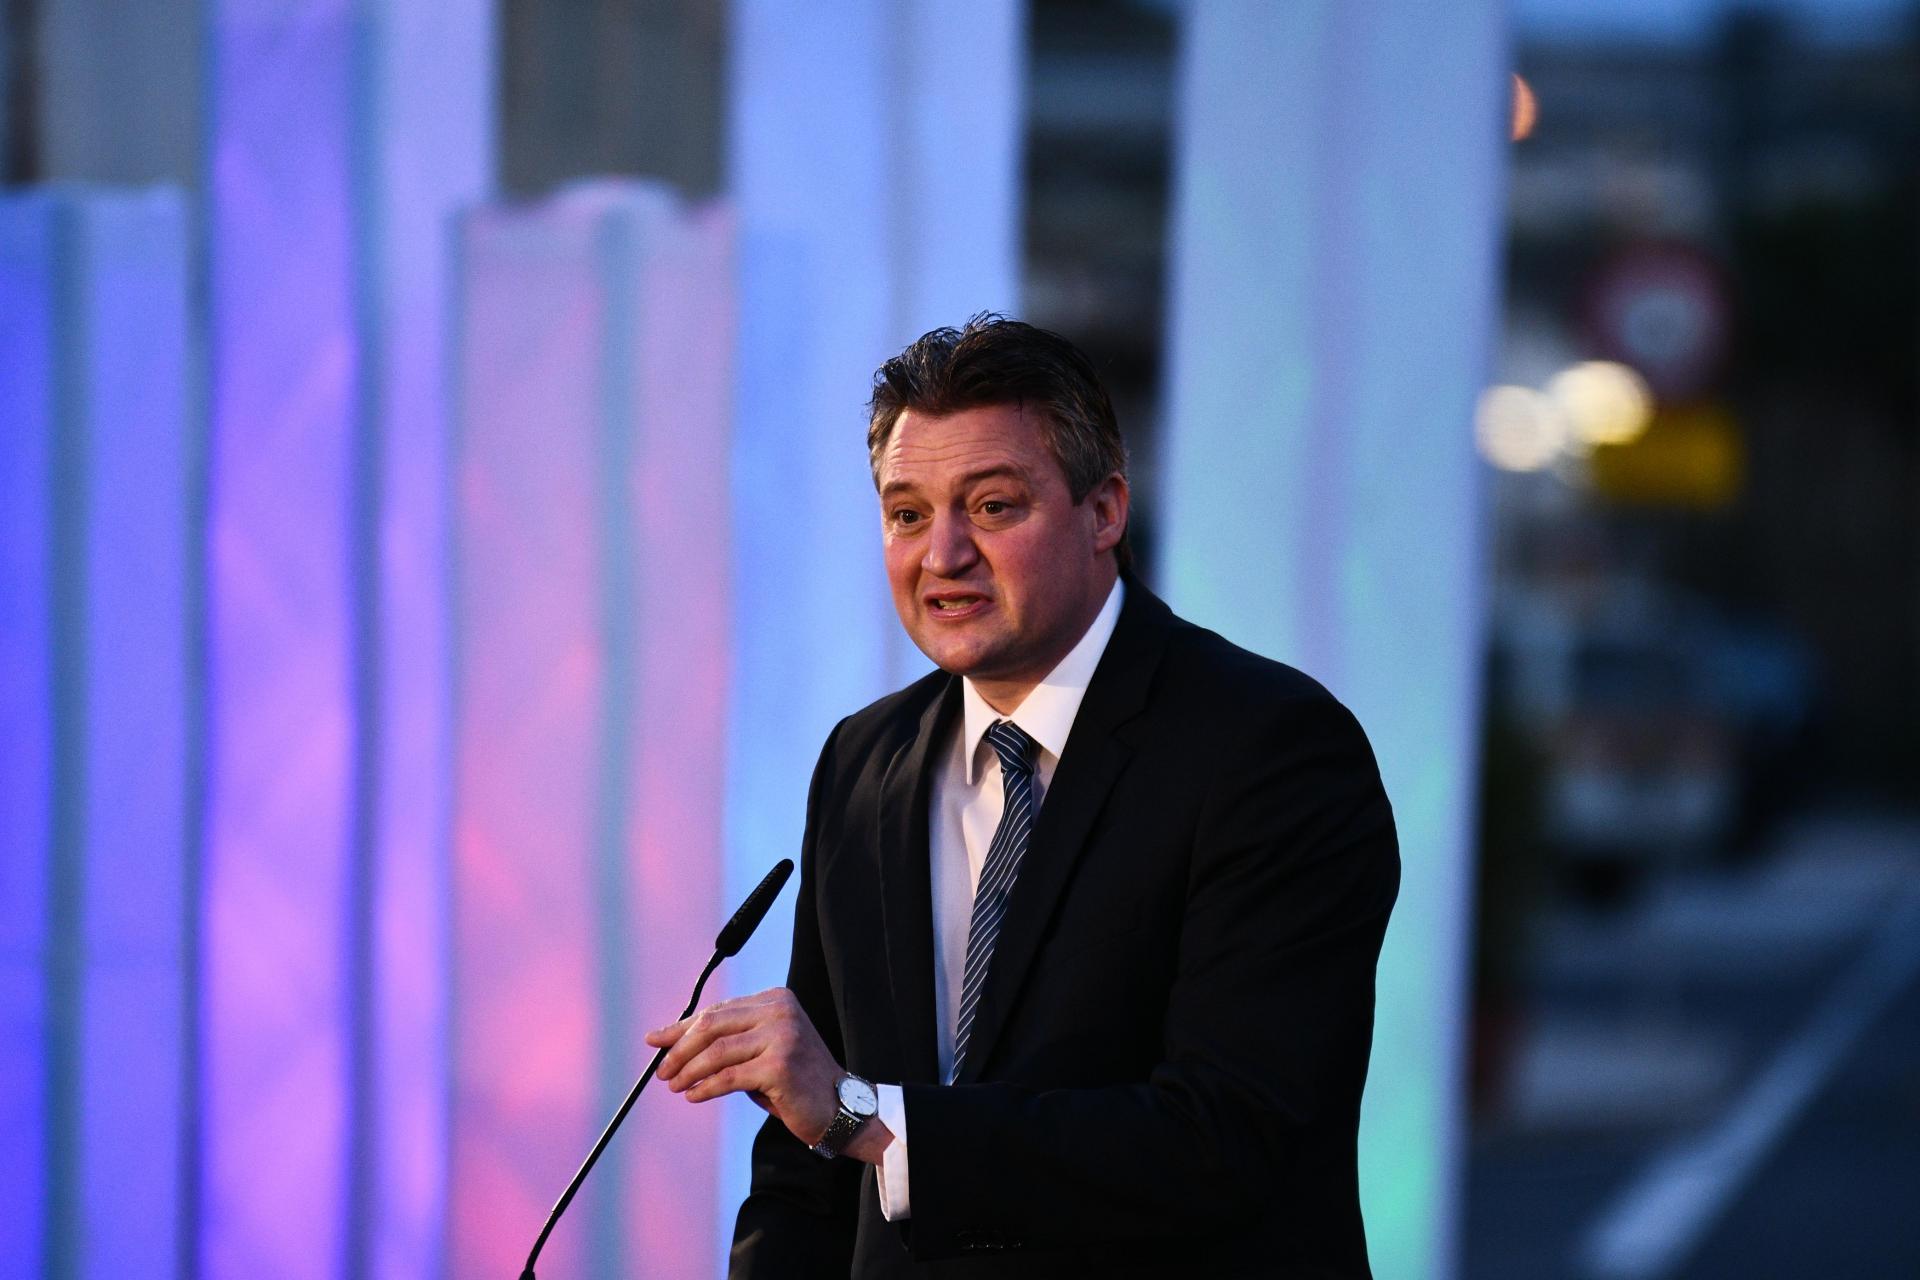 Konrad Mizzi speaking during the inauguration of the Electrogas power station. Photo: Jason Borg/DOI